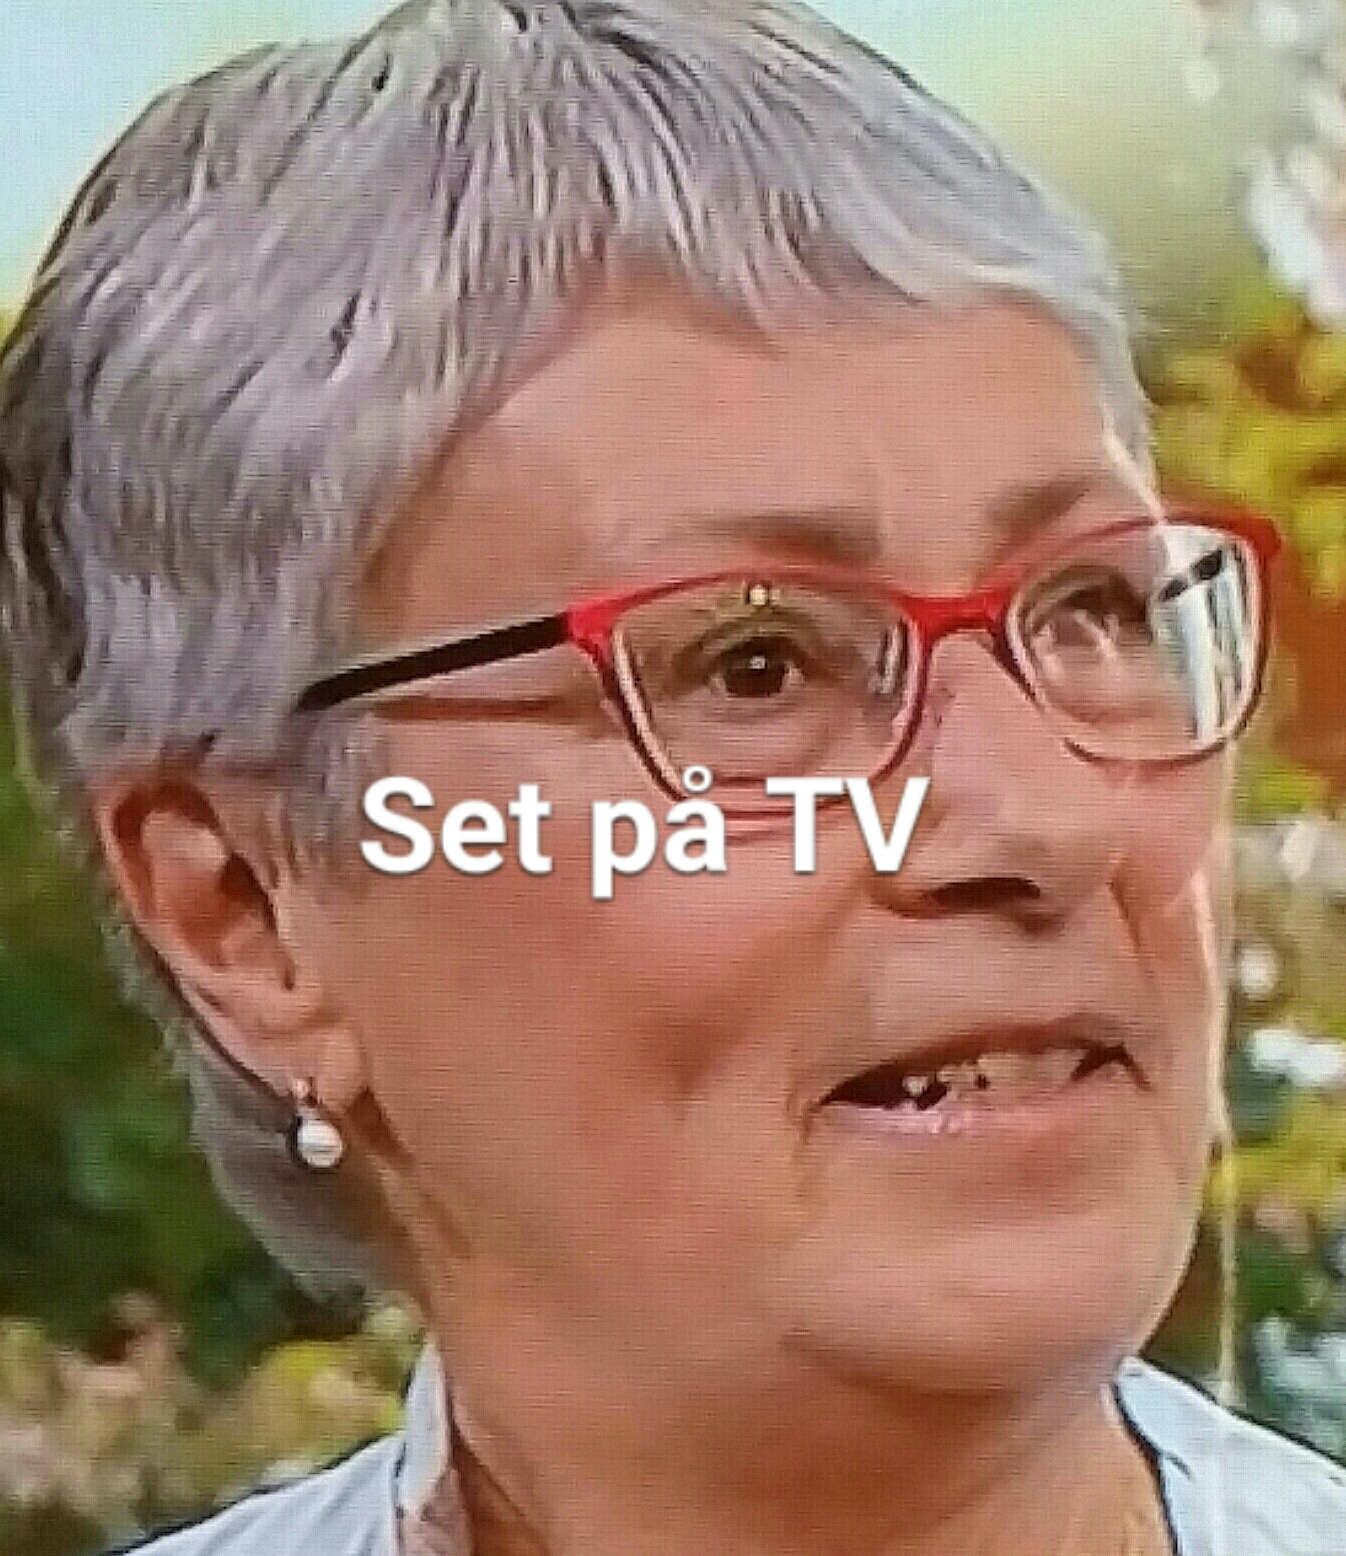 Margit Vestergaard. Solstrejf. Alternative Behandlere Net.